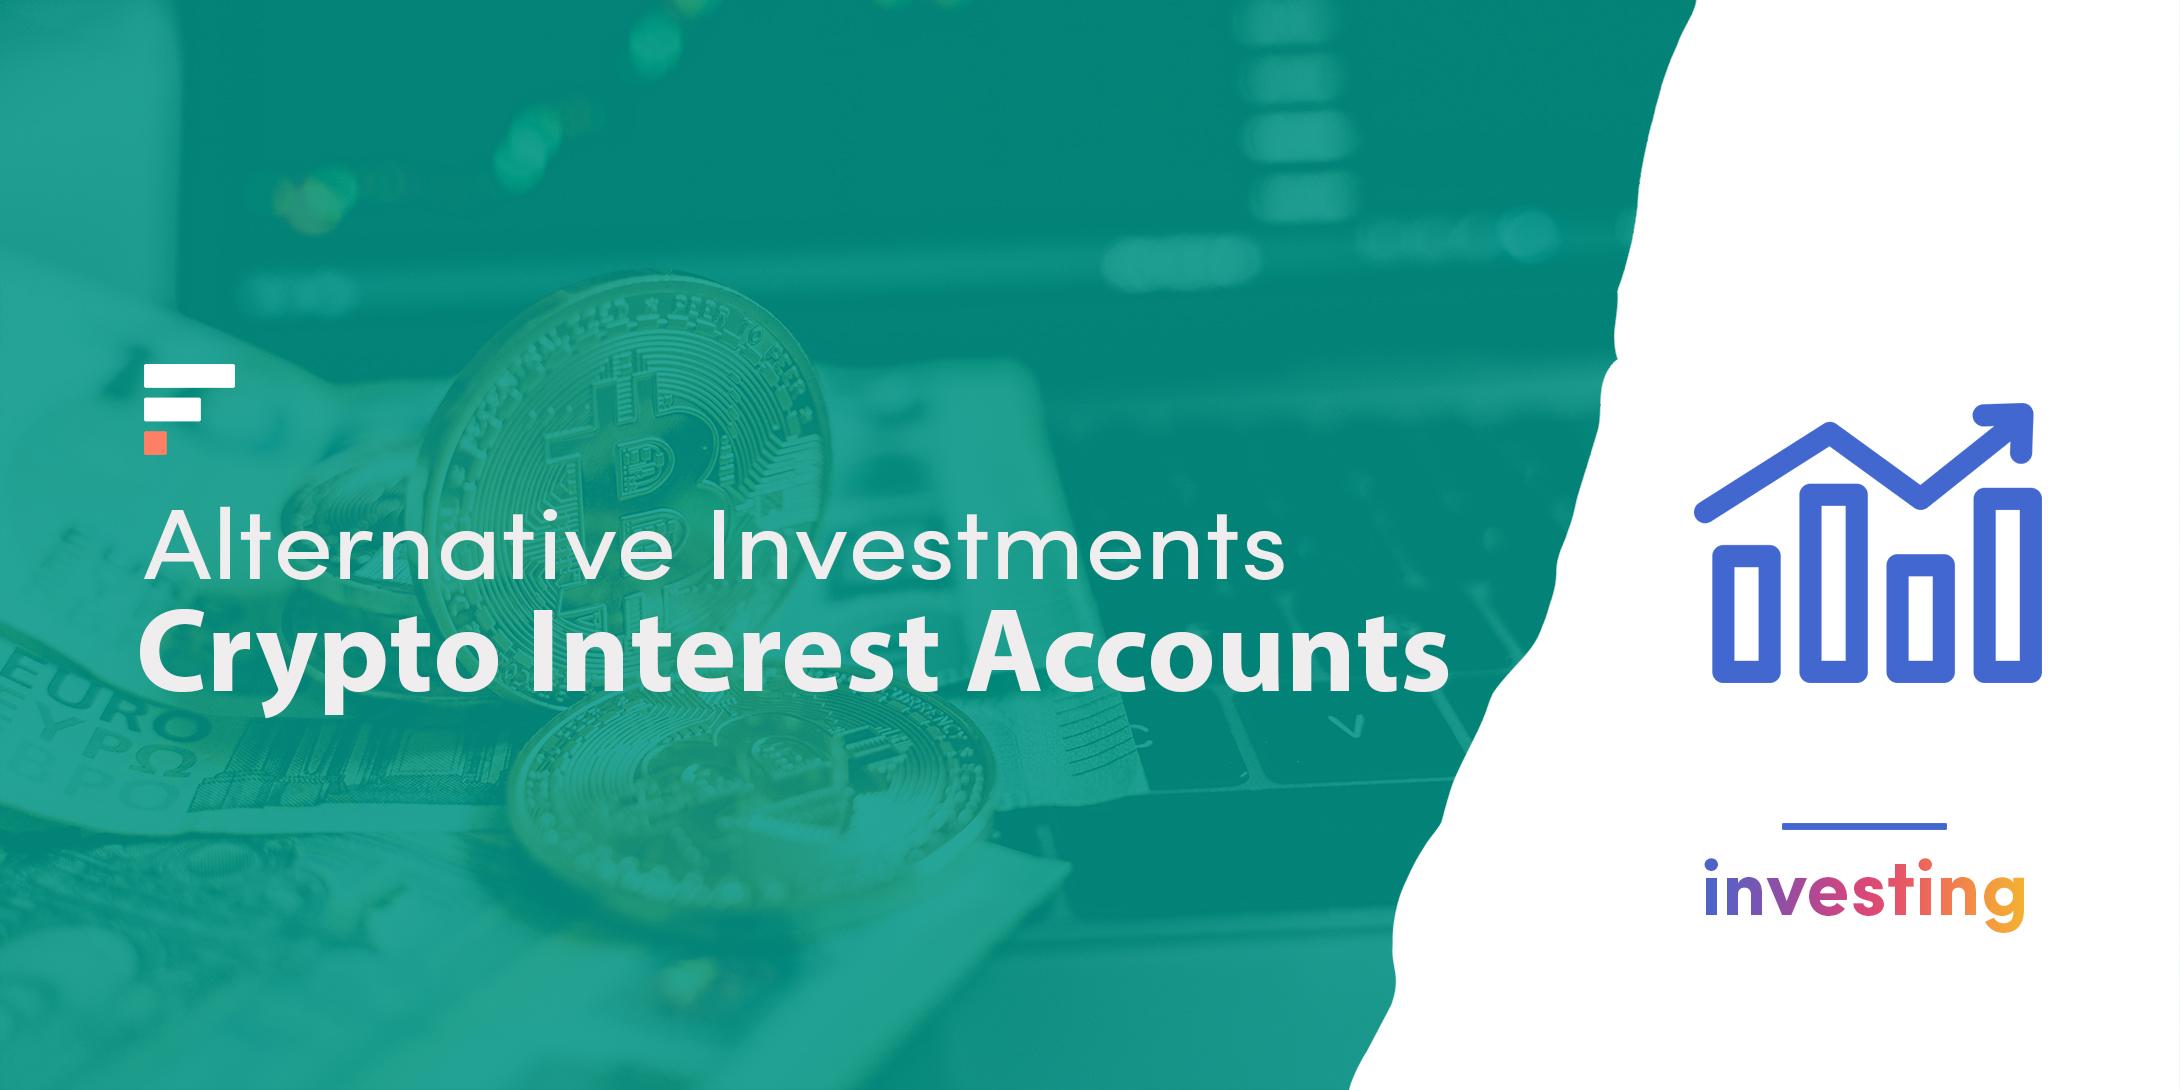 Crypto interest accounts